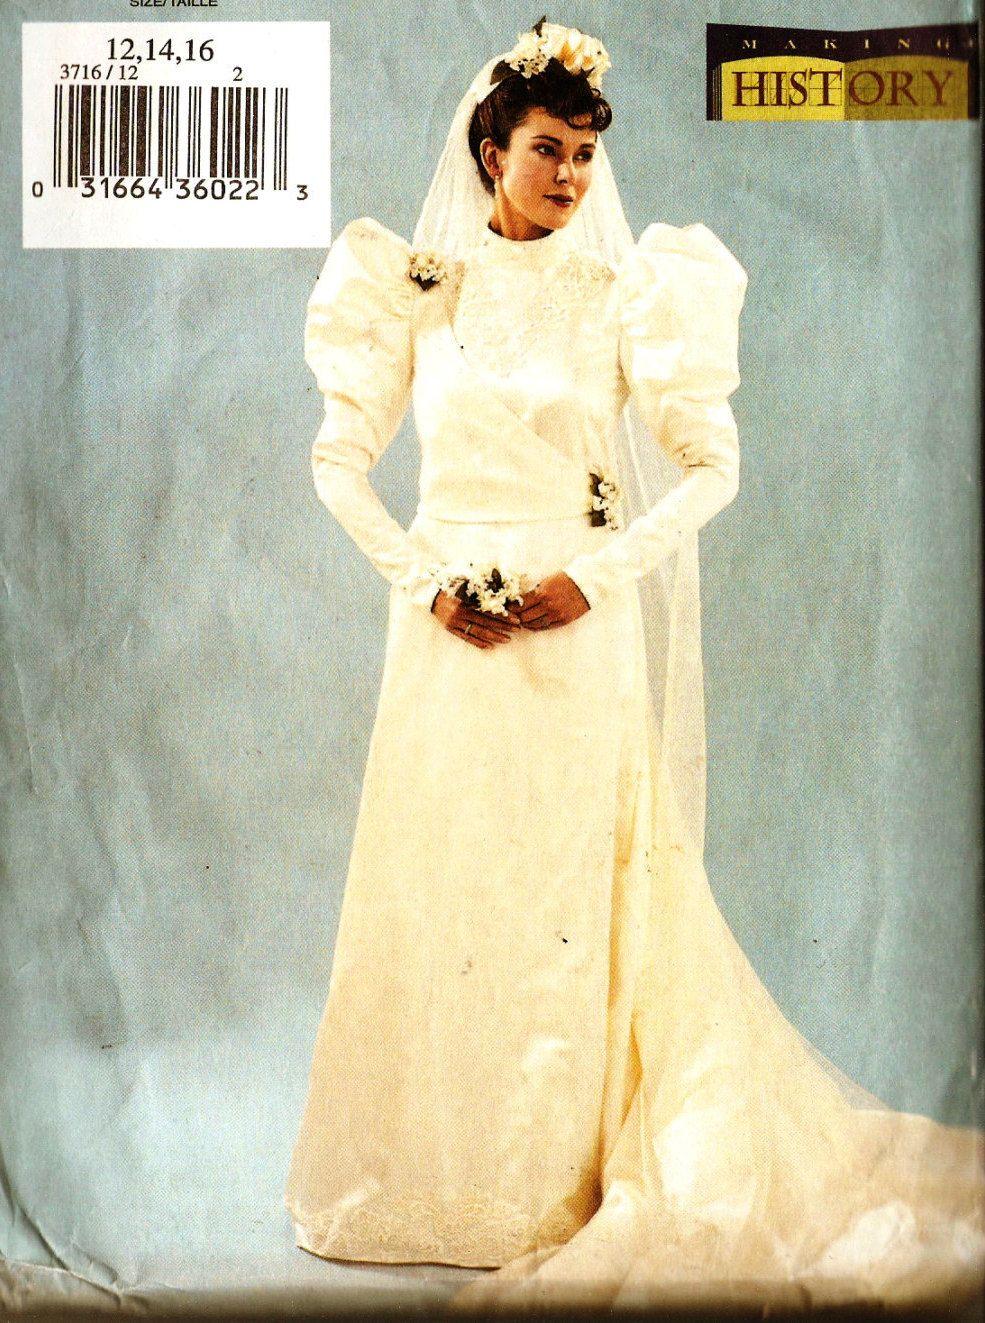 Butterick 3716 Misses\' Historical Victorian Era Bride Costume Dress ...